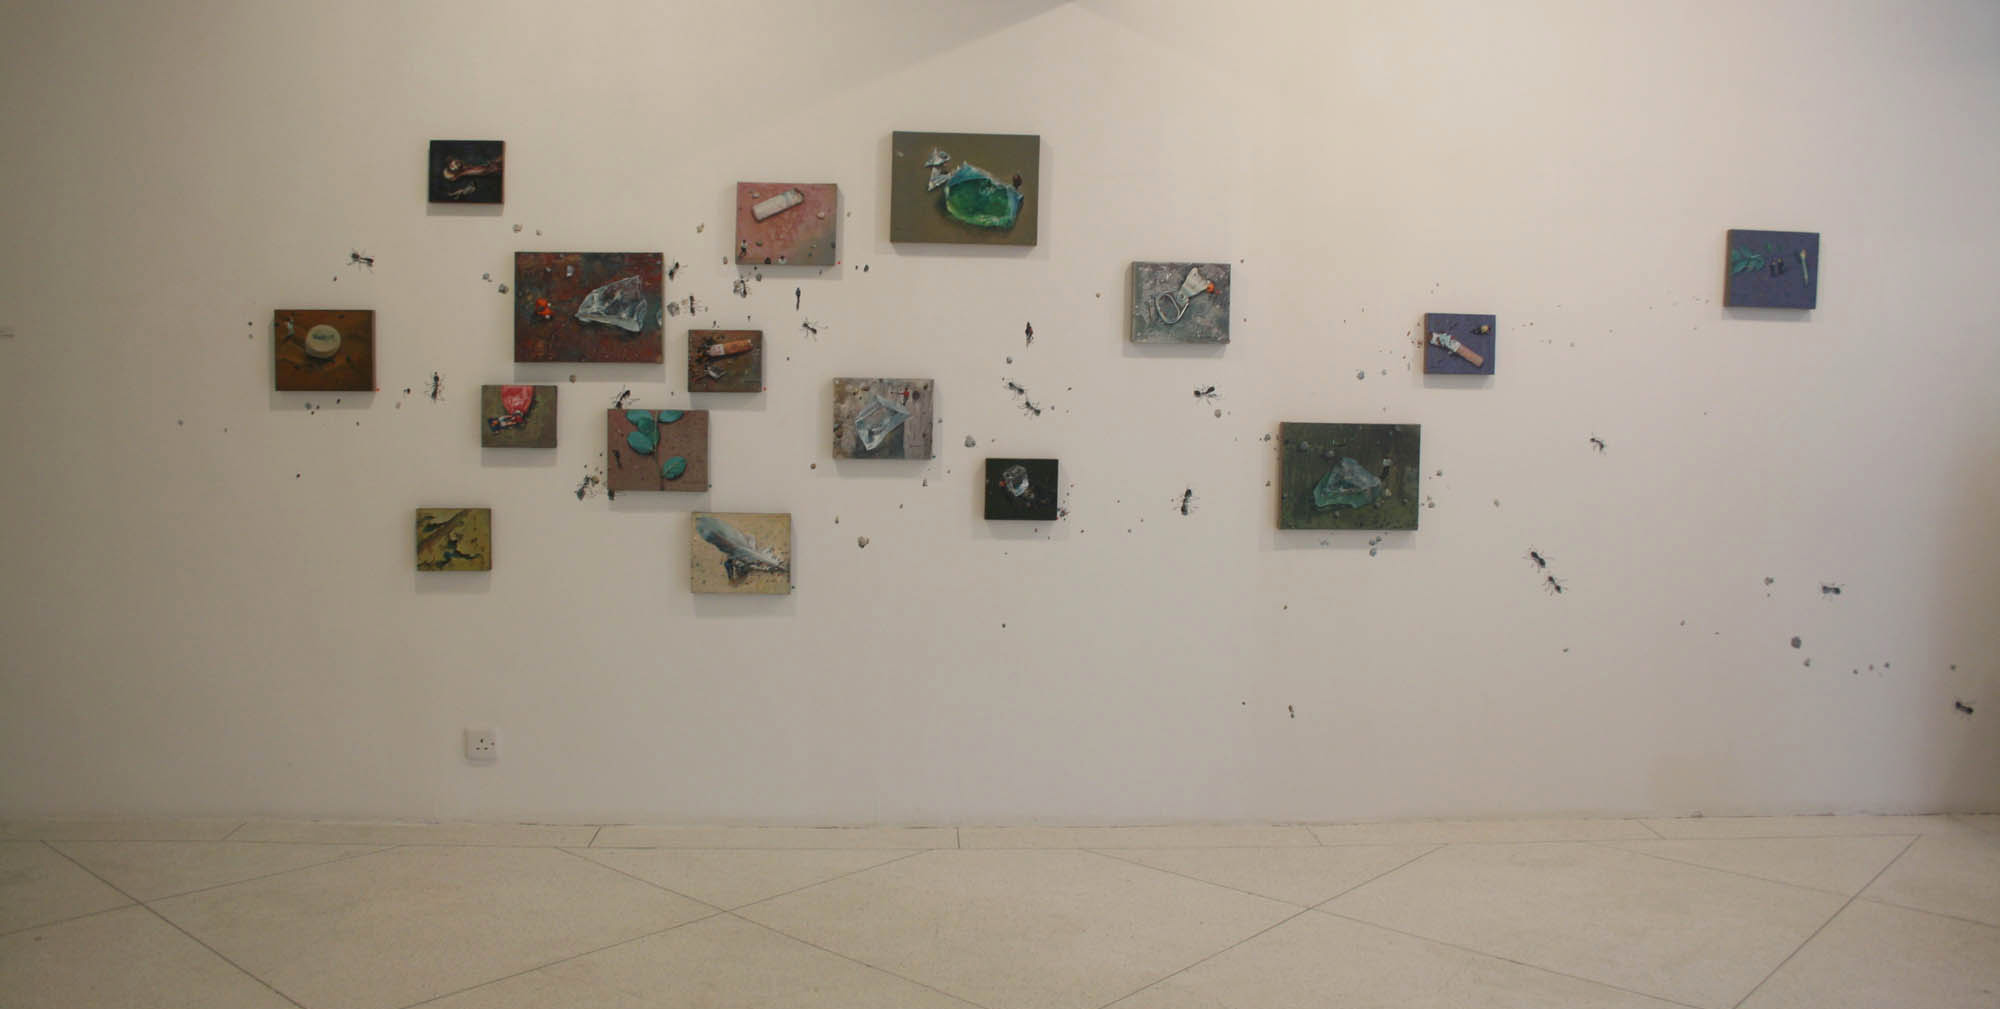 Zhou Jinhua 周金华, The Lost Angels 天使遗落在人间, 2011, Painting installation 布面油画装置, Dimensions variable 尺寸可变